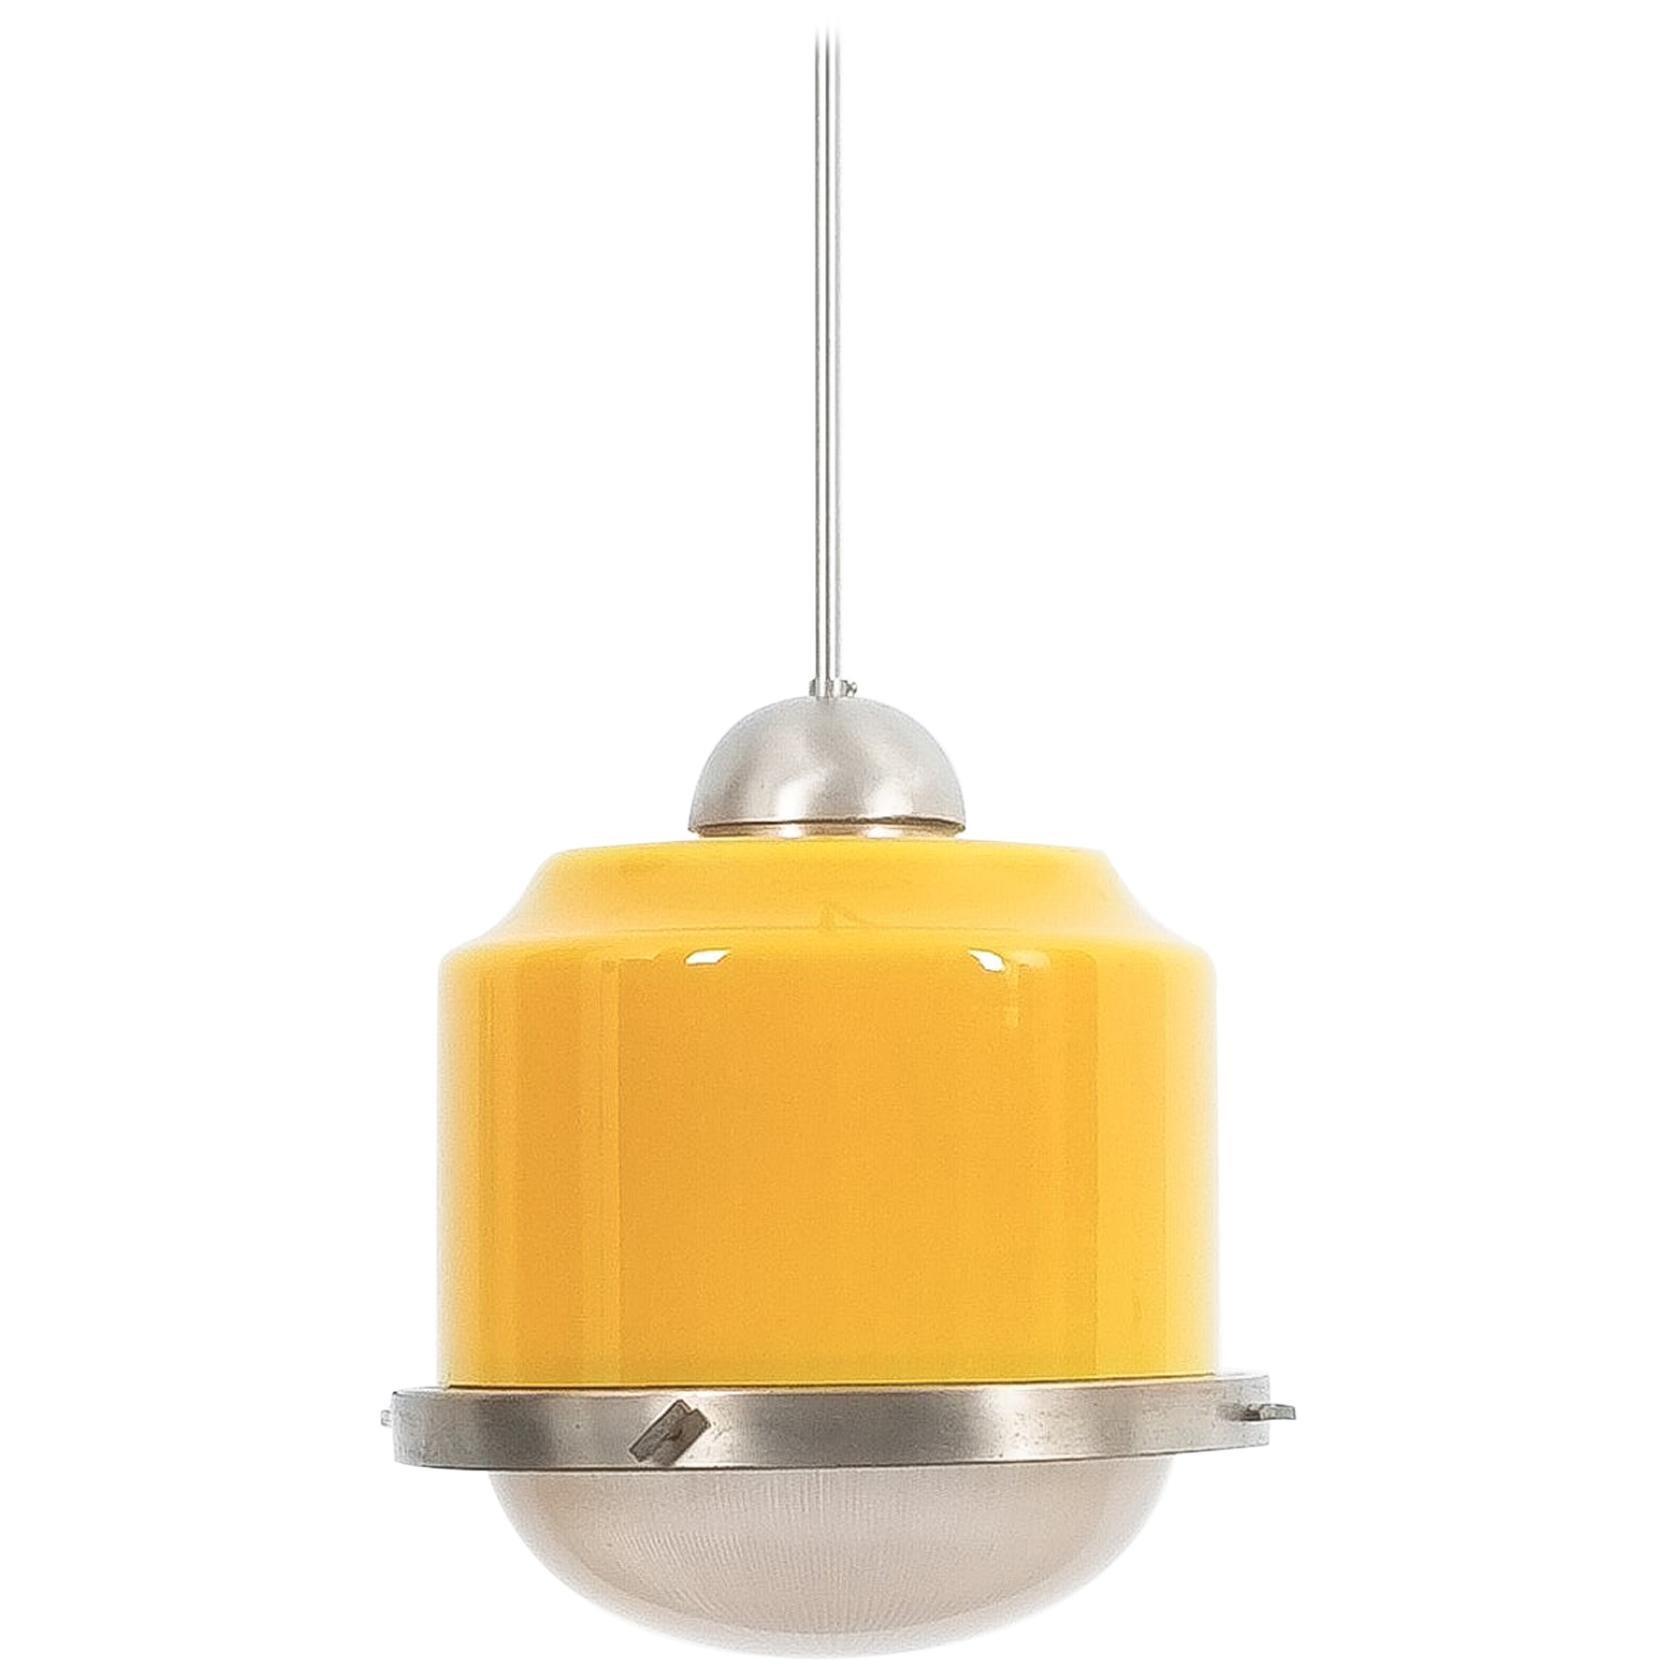 Stilnovo Yellow Glass Pendant Lamp Glass, circa 1950